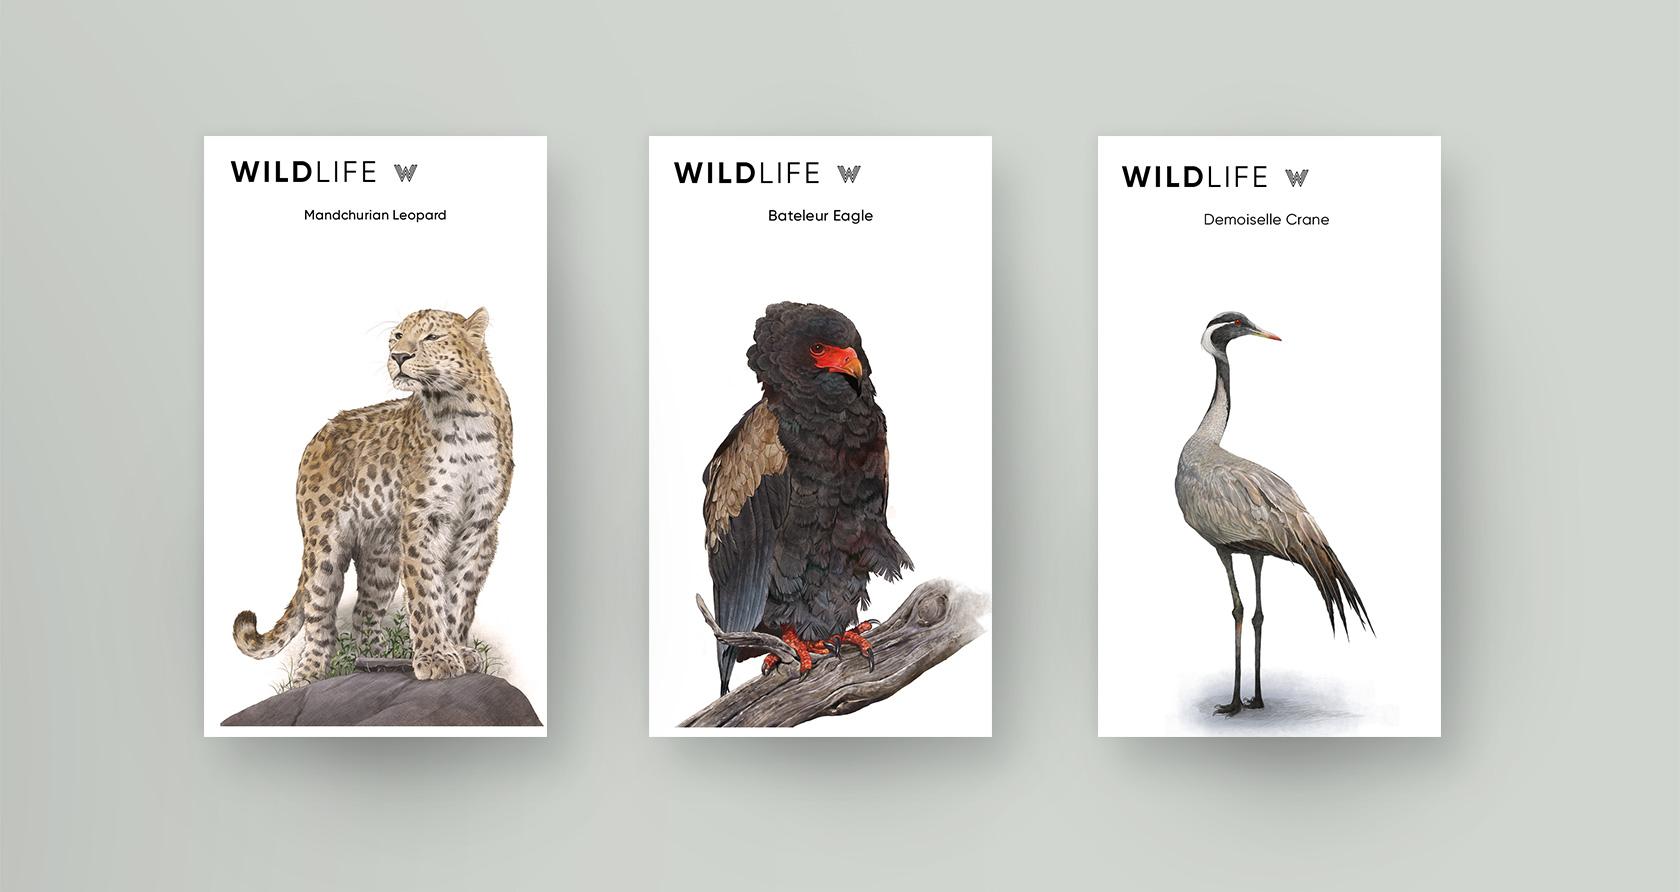 Animal Illustrated(2019)